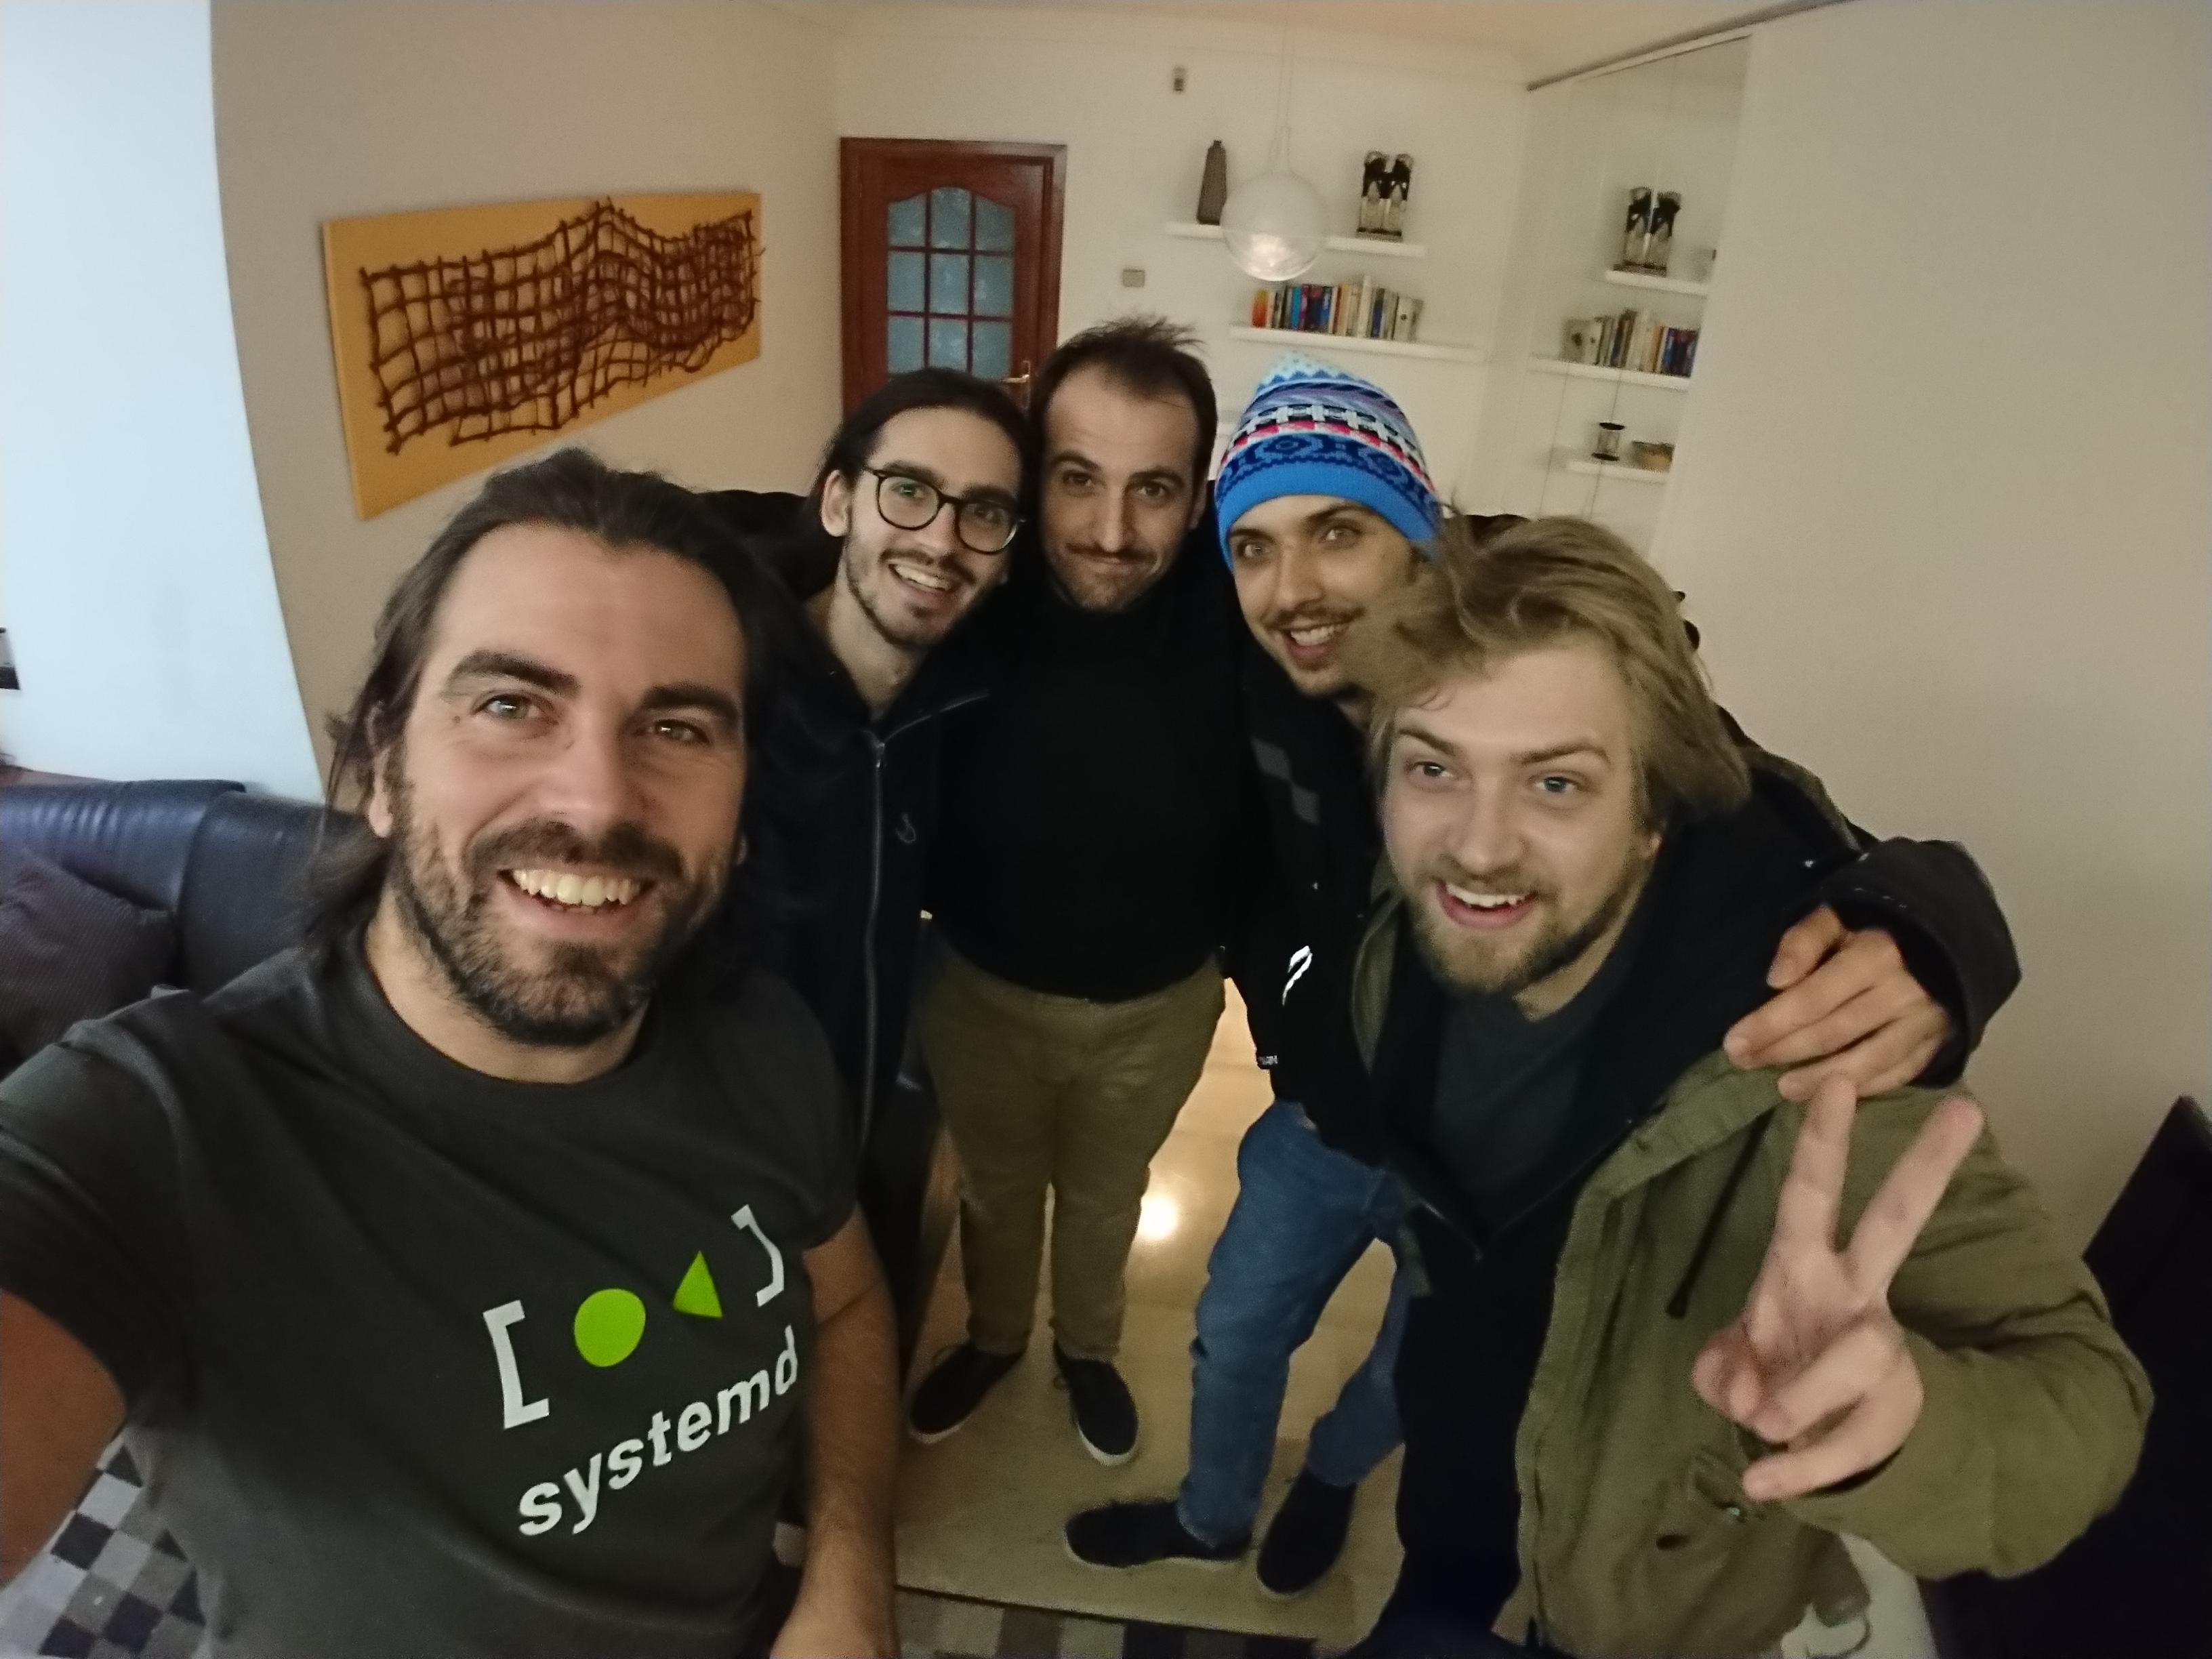 Javier, Tobias, me, Julian and Lubosz